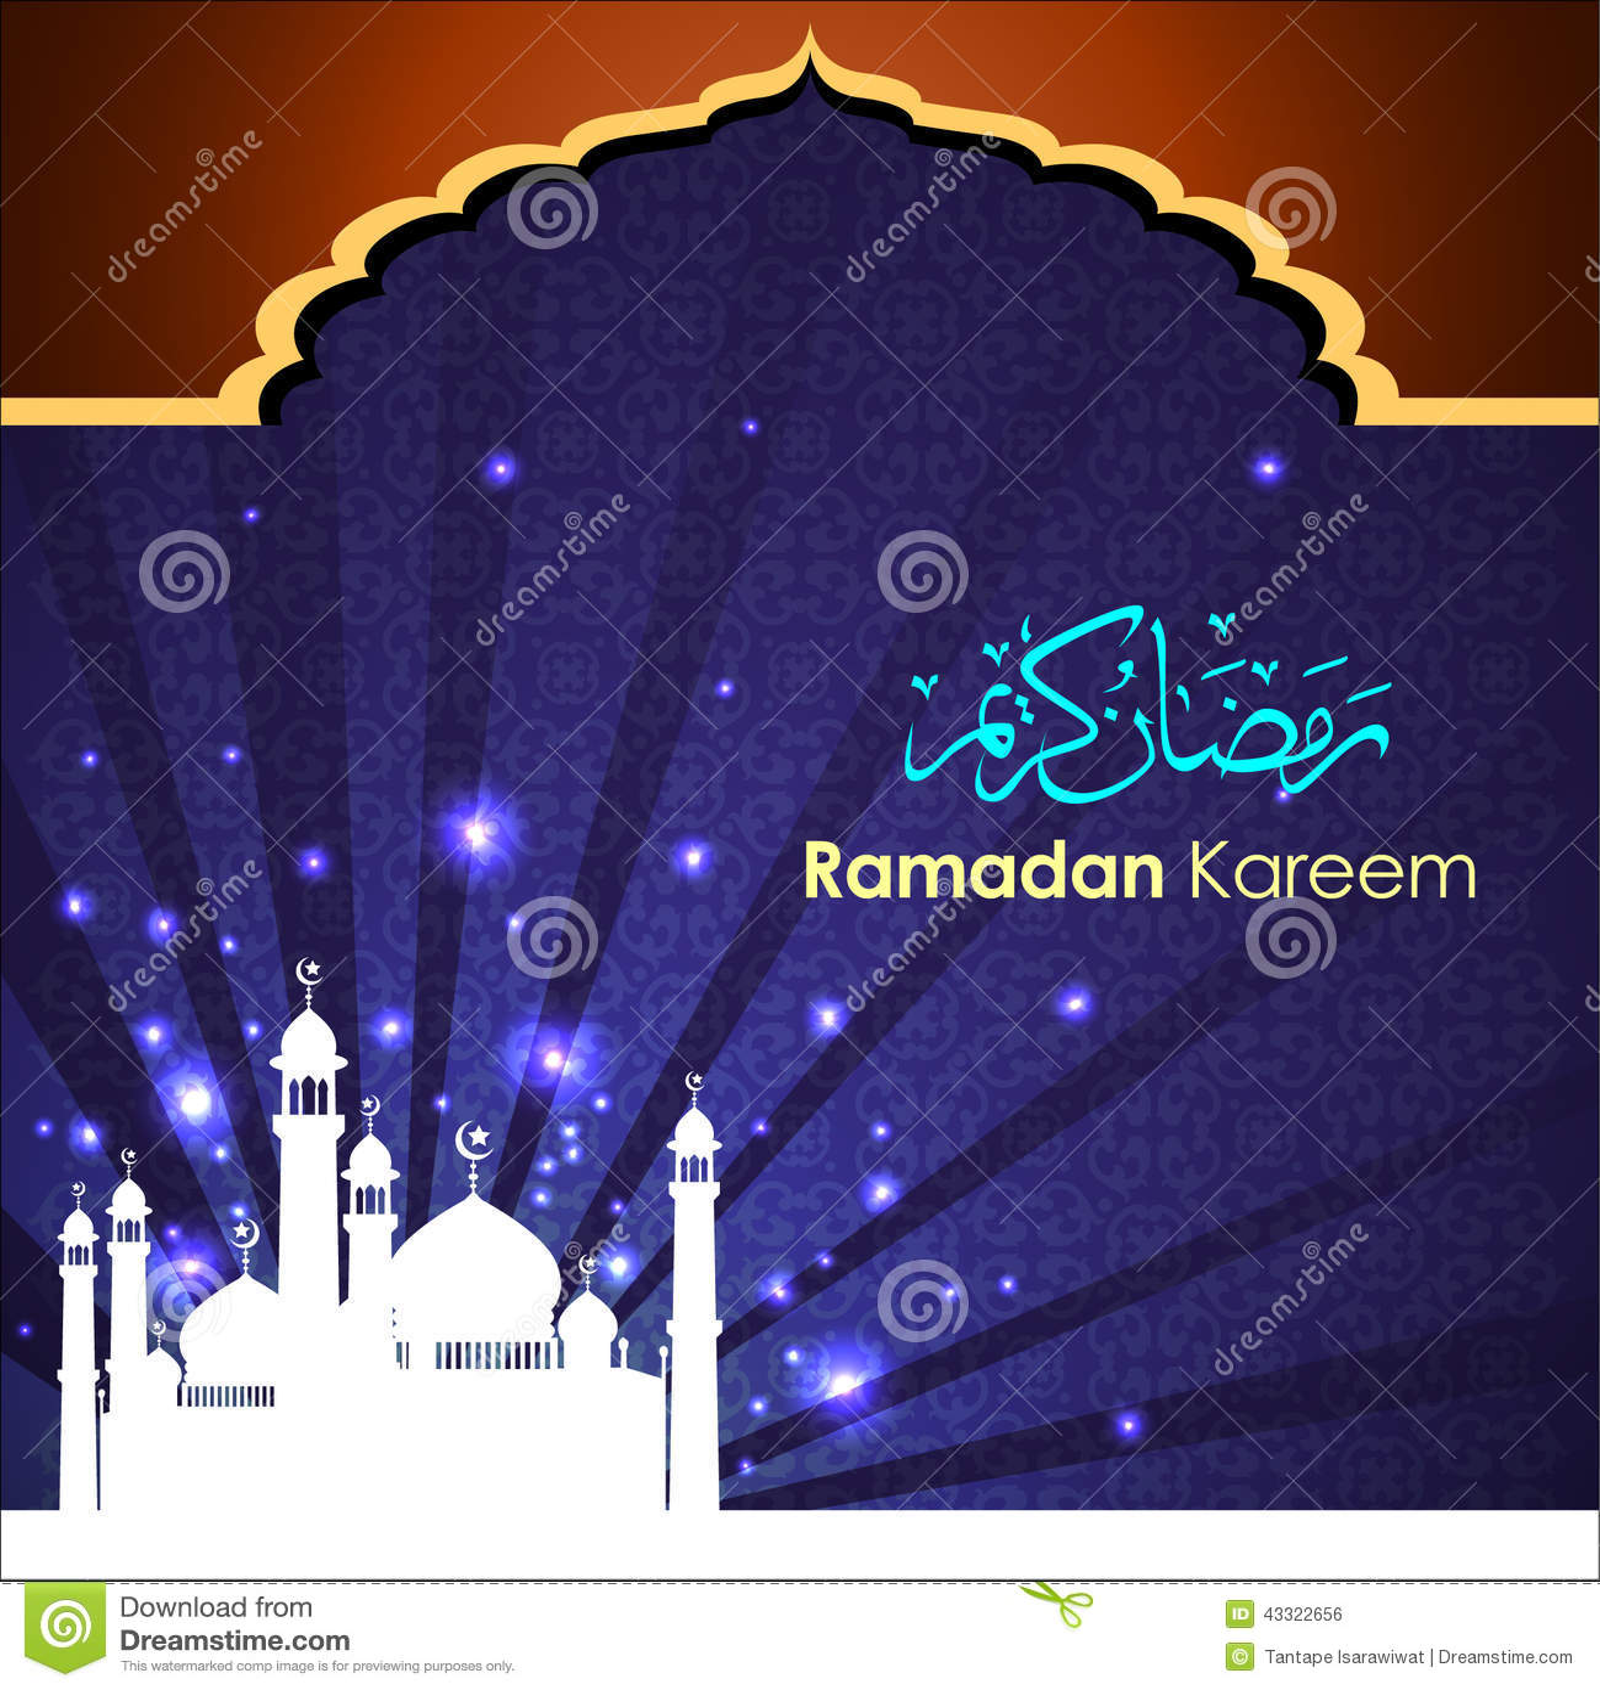 Ramadan Greetings In Arabic Script Stock Vector Illustration Of